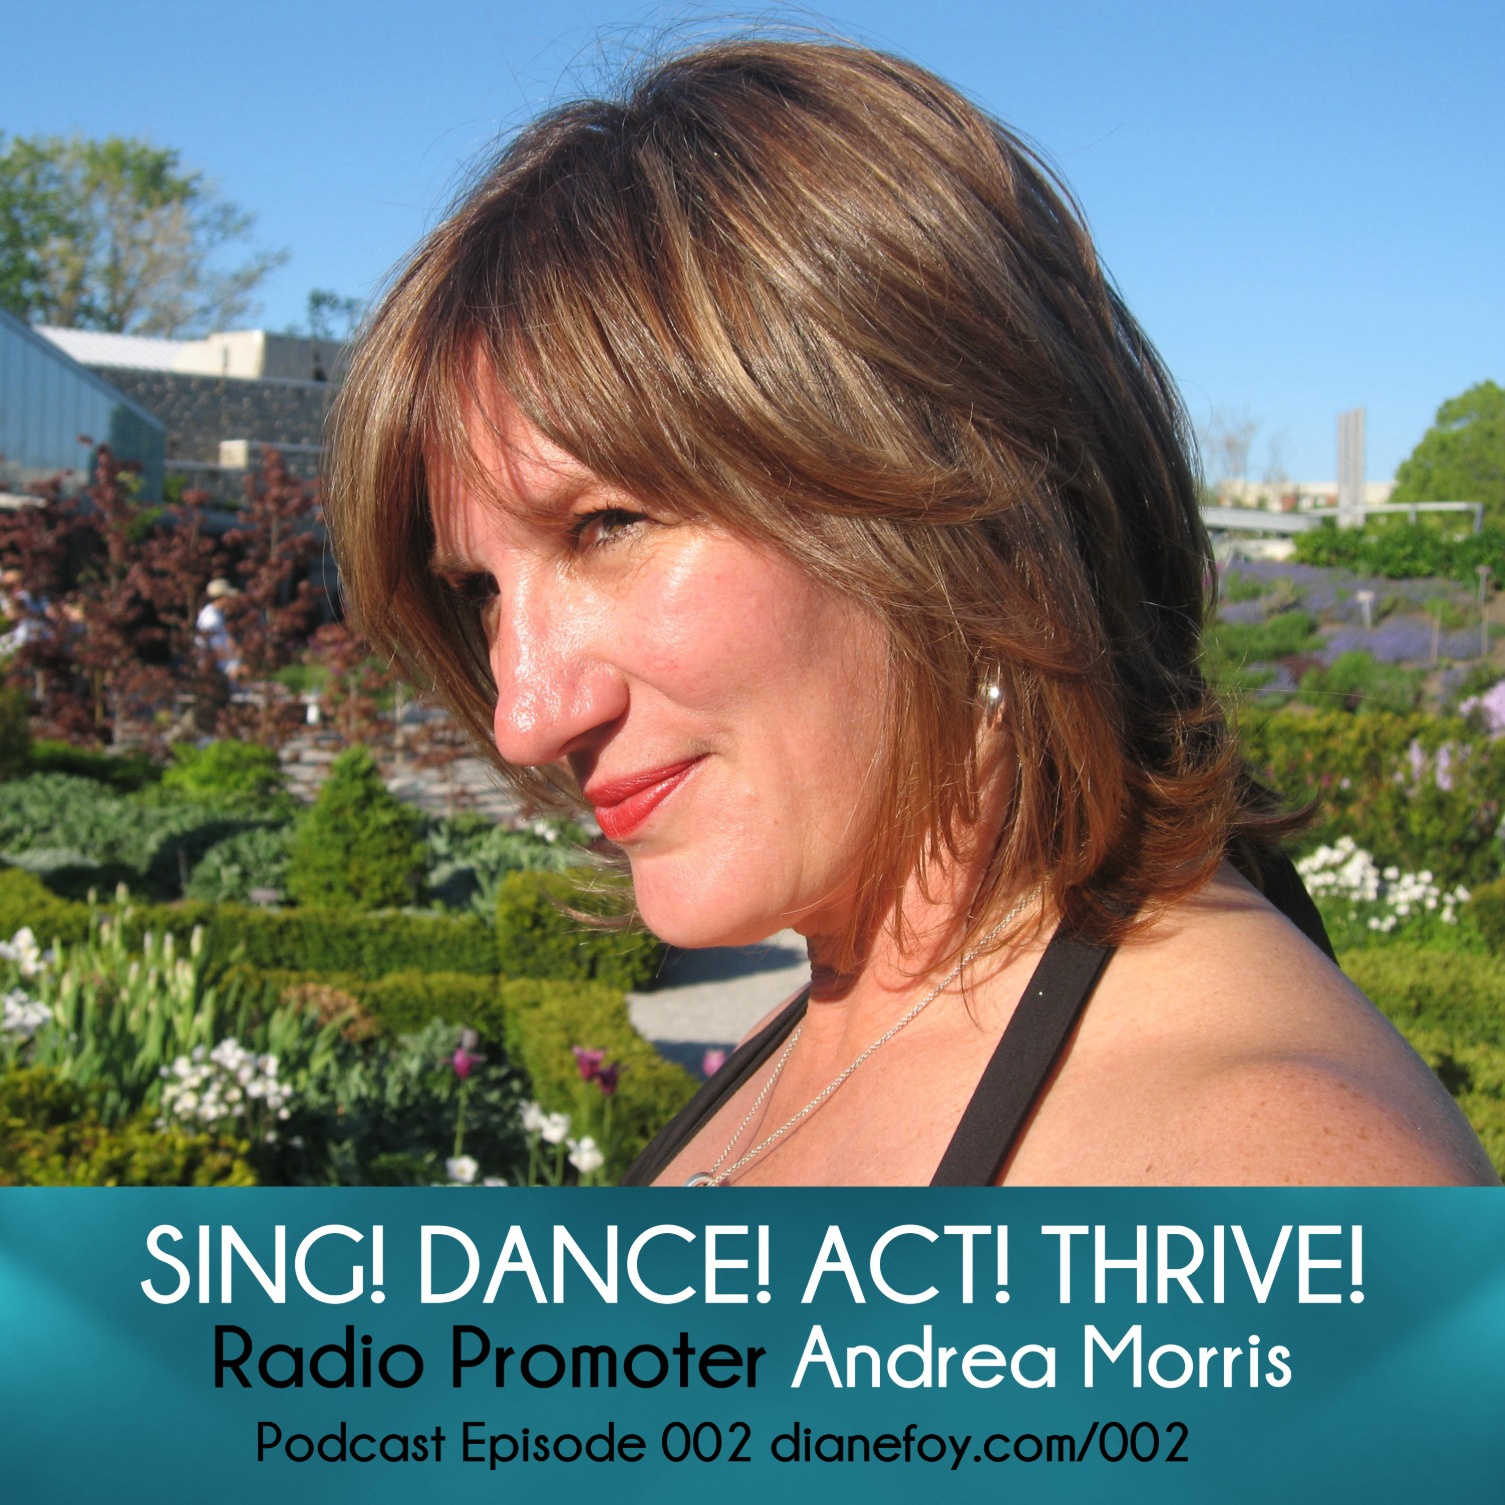 Andrea Morris, Radio Promoter